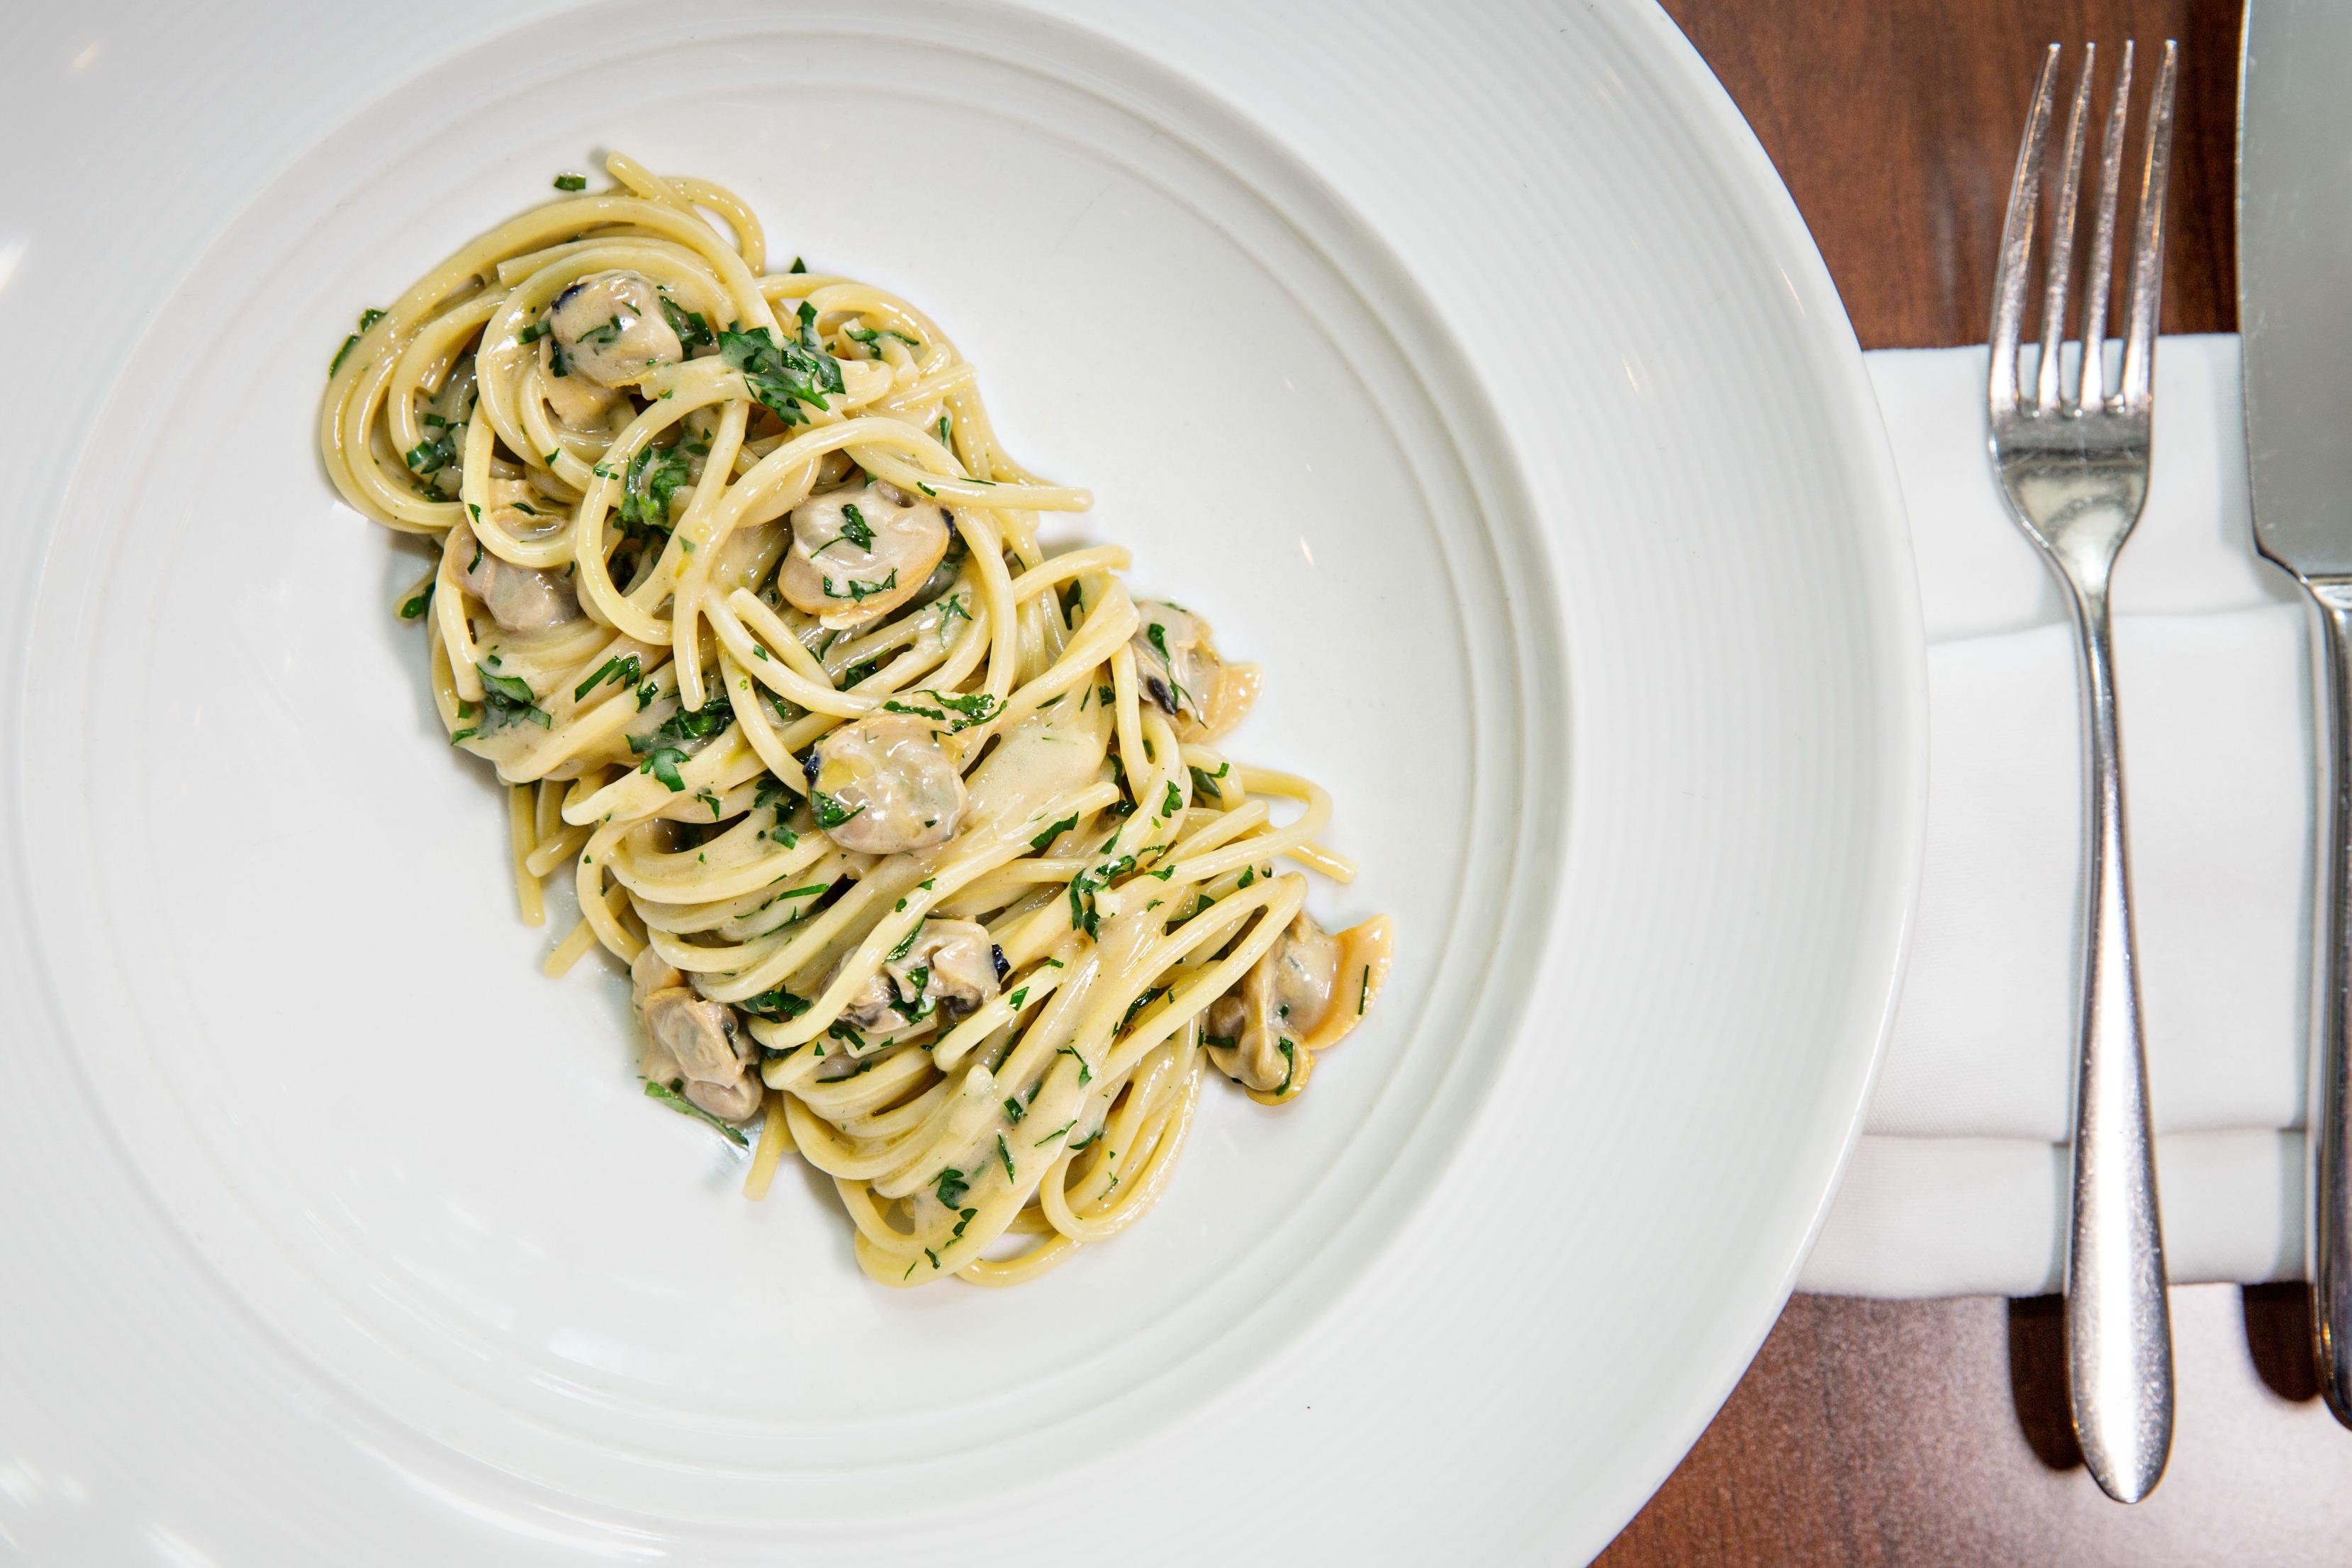 Spaghetti with North Carolina Clams